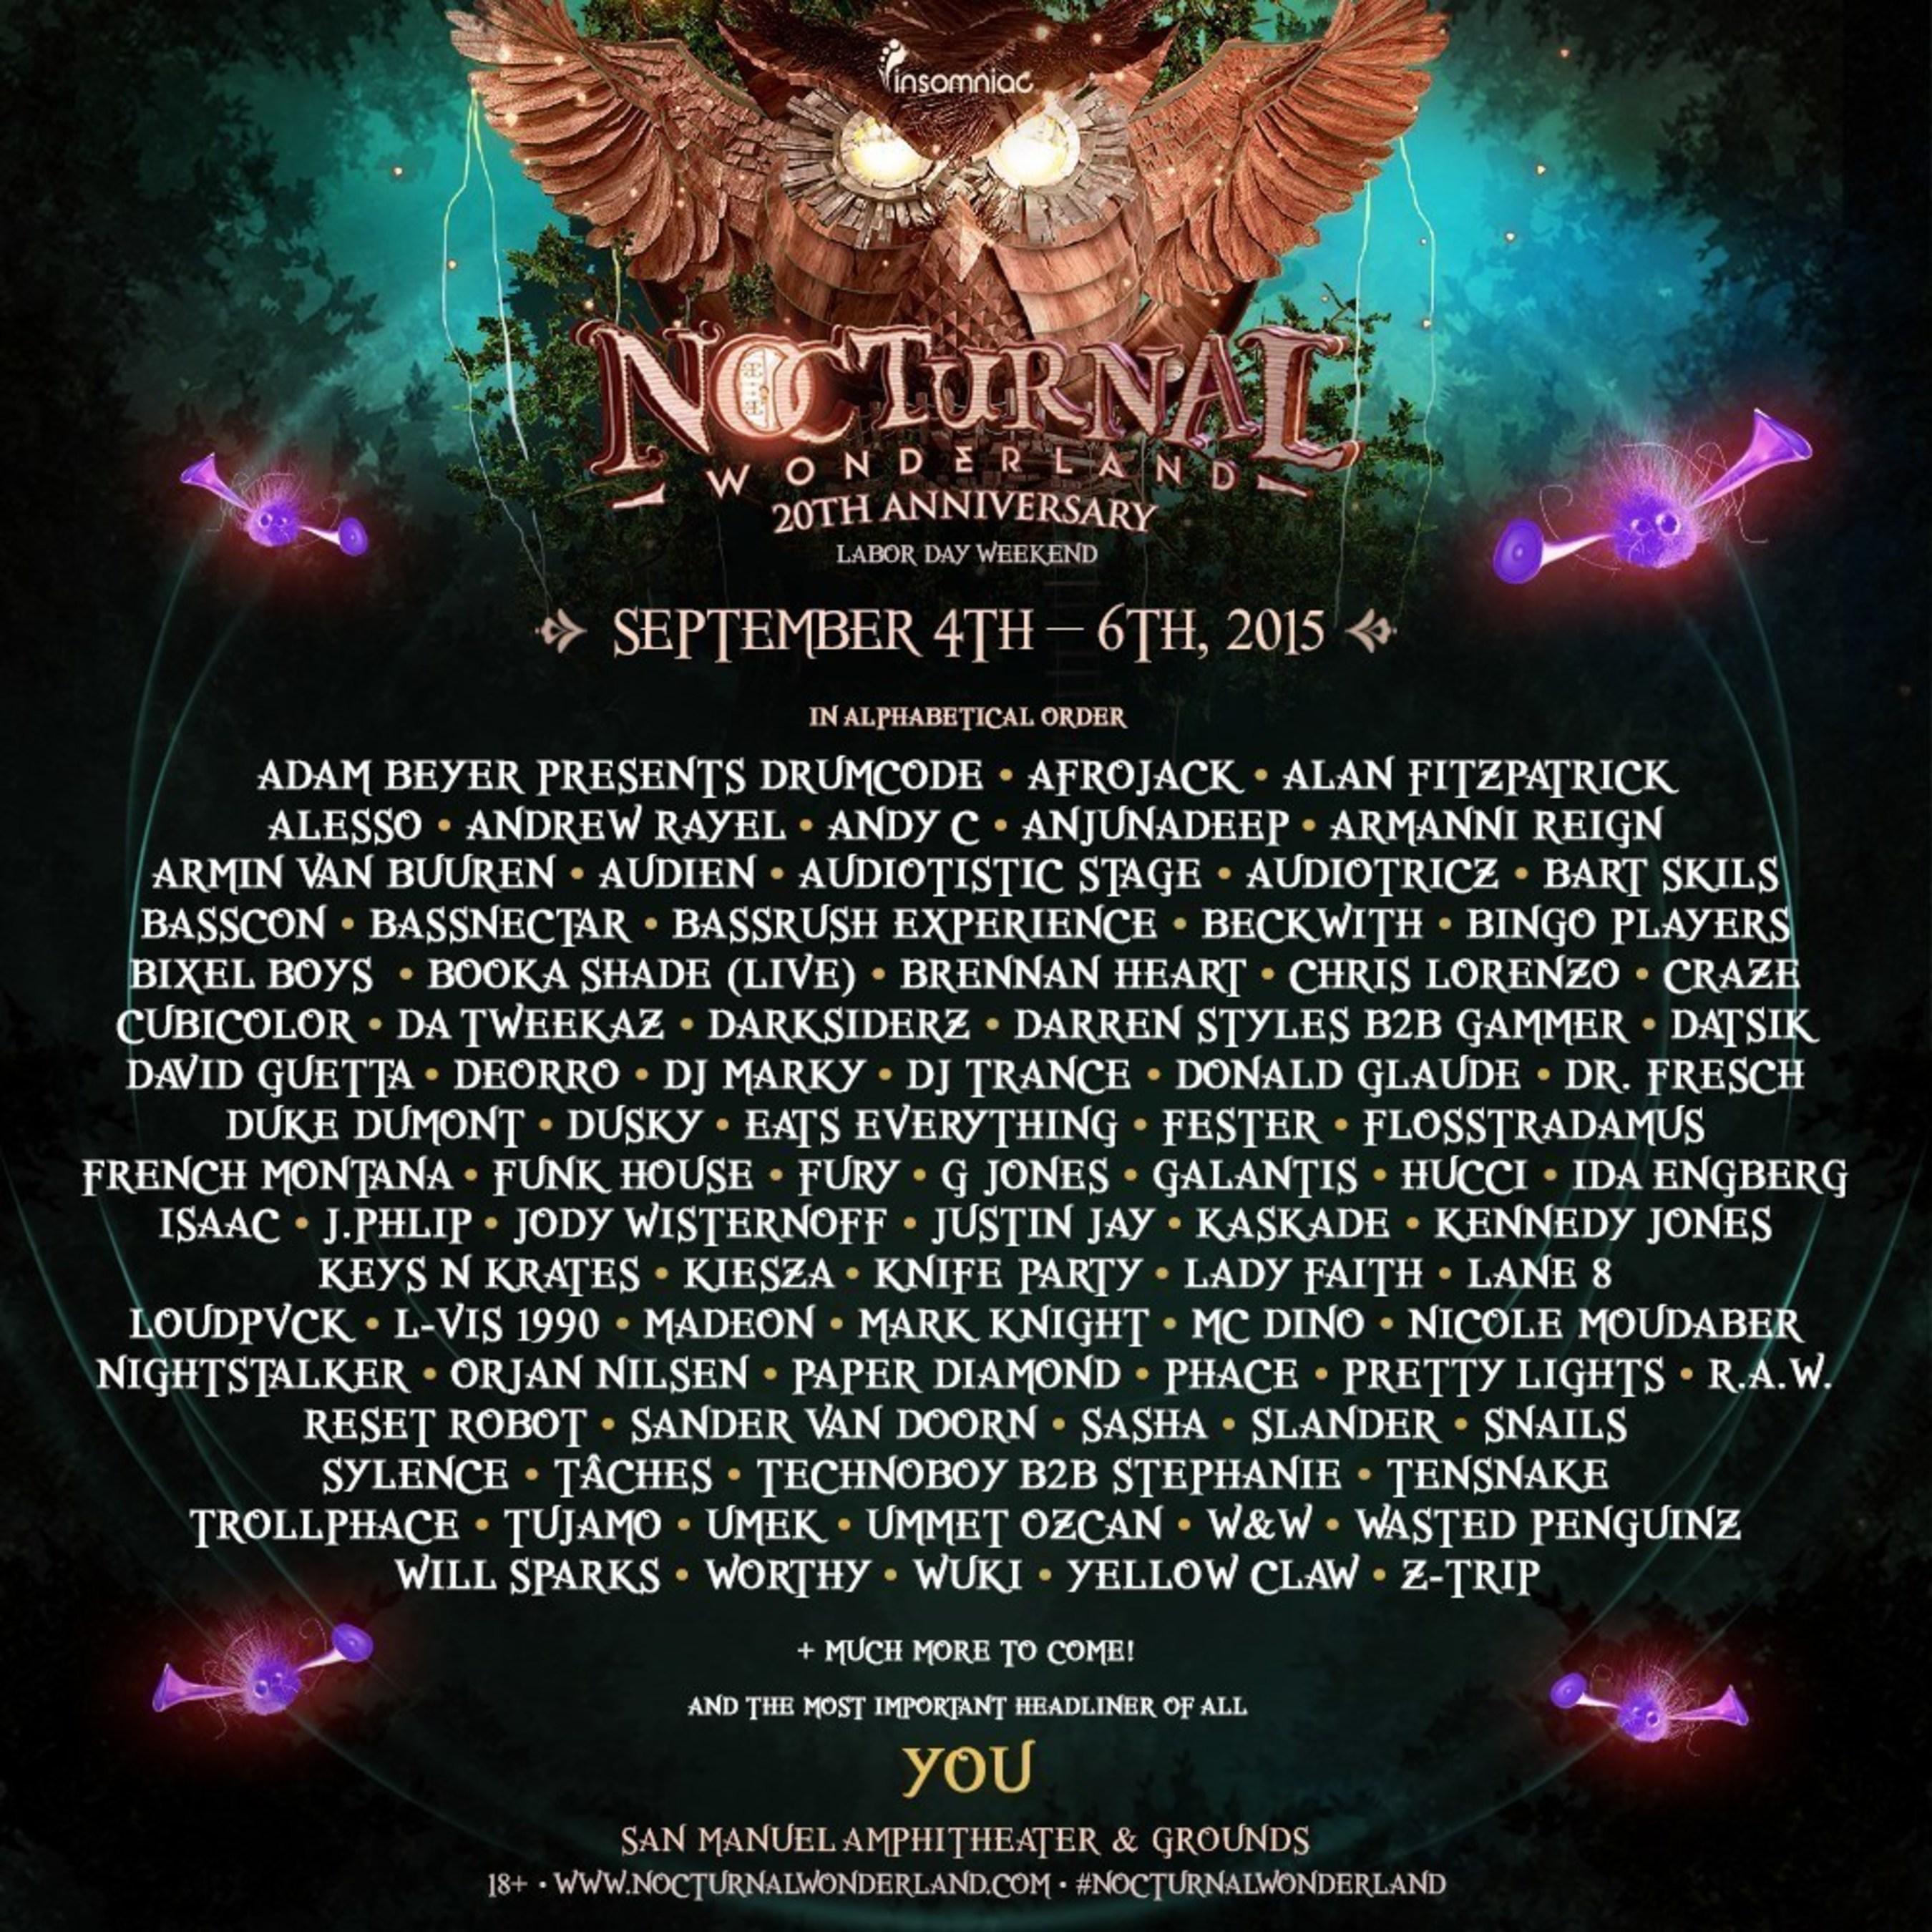 Insomniac Reveals Impressive Artist Line-Up for 20th Anniversary of Nocturnal Wonderland